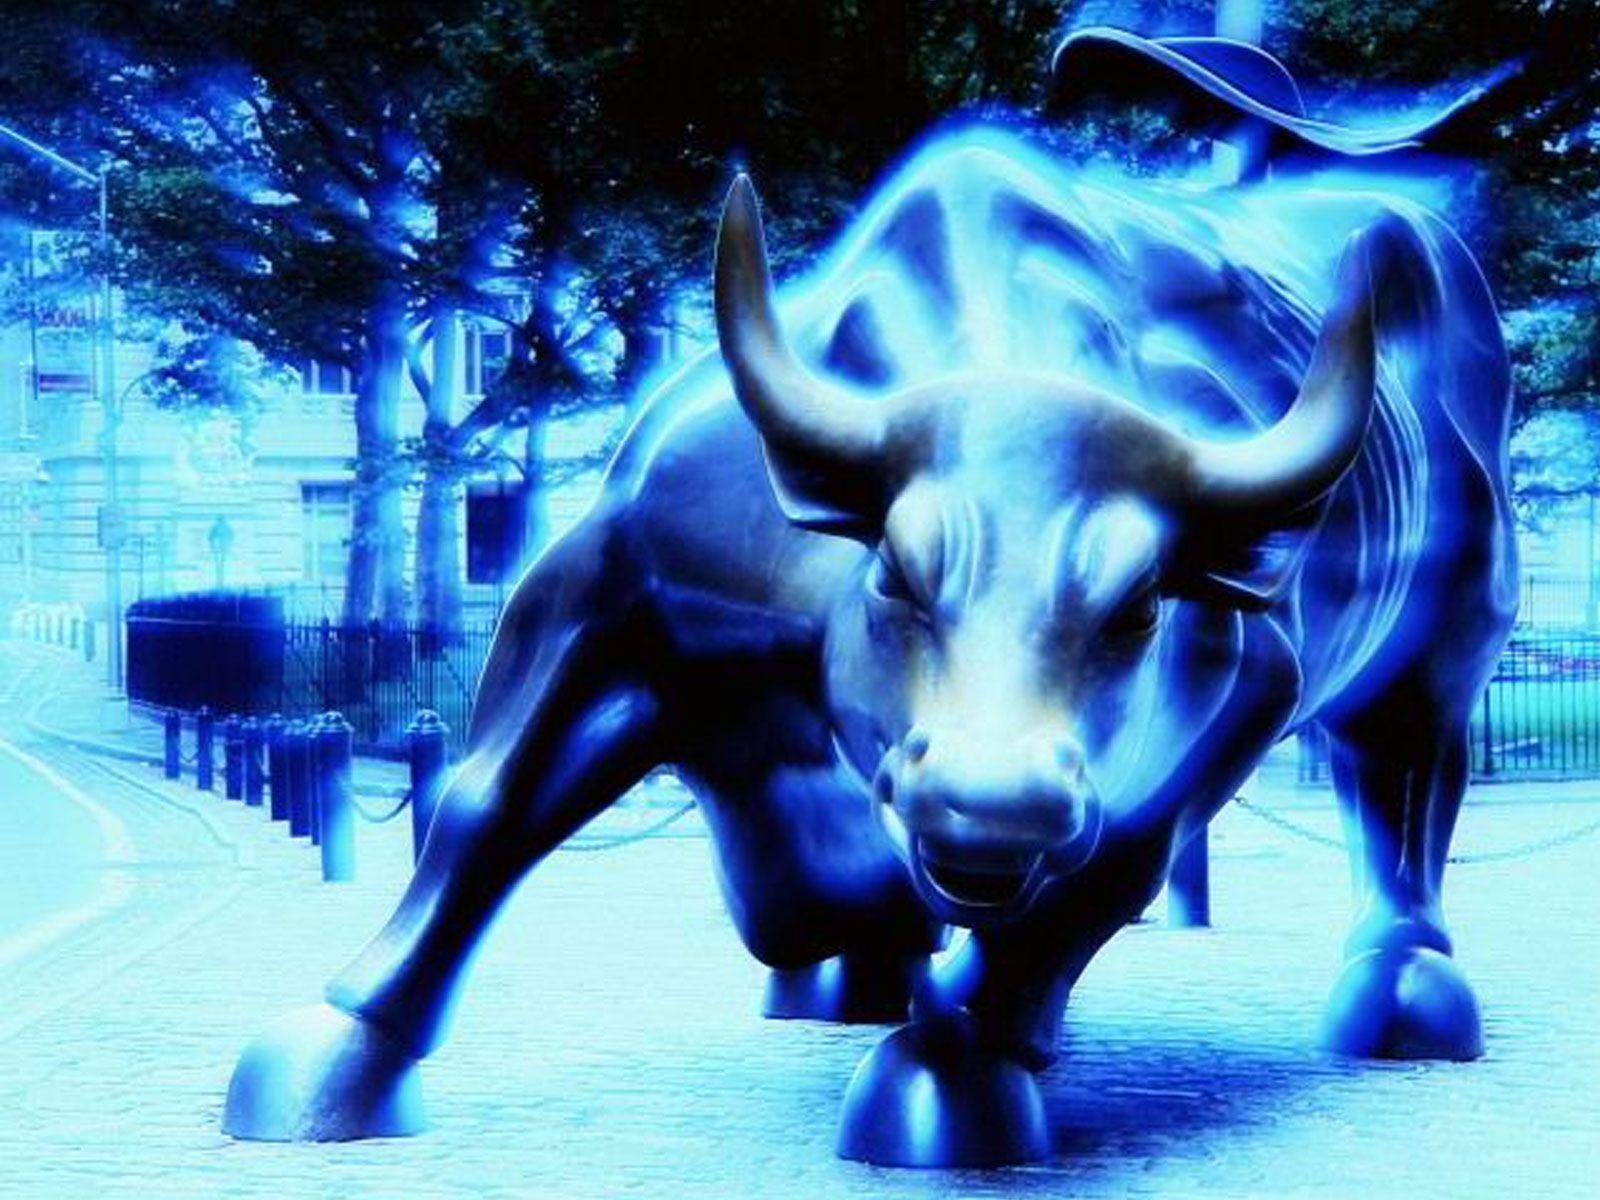 Blue Bulls Wallpapers 1600x1200